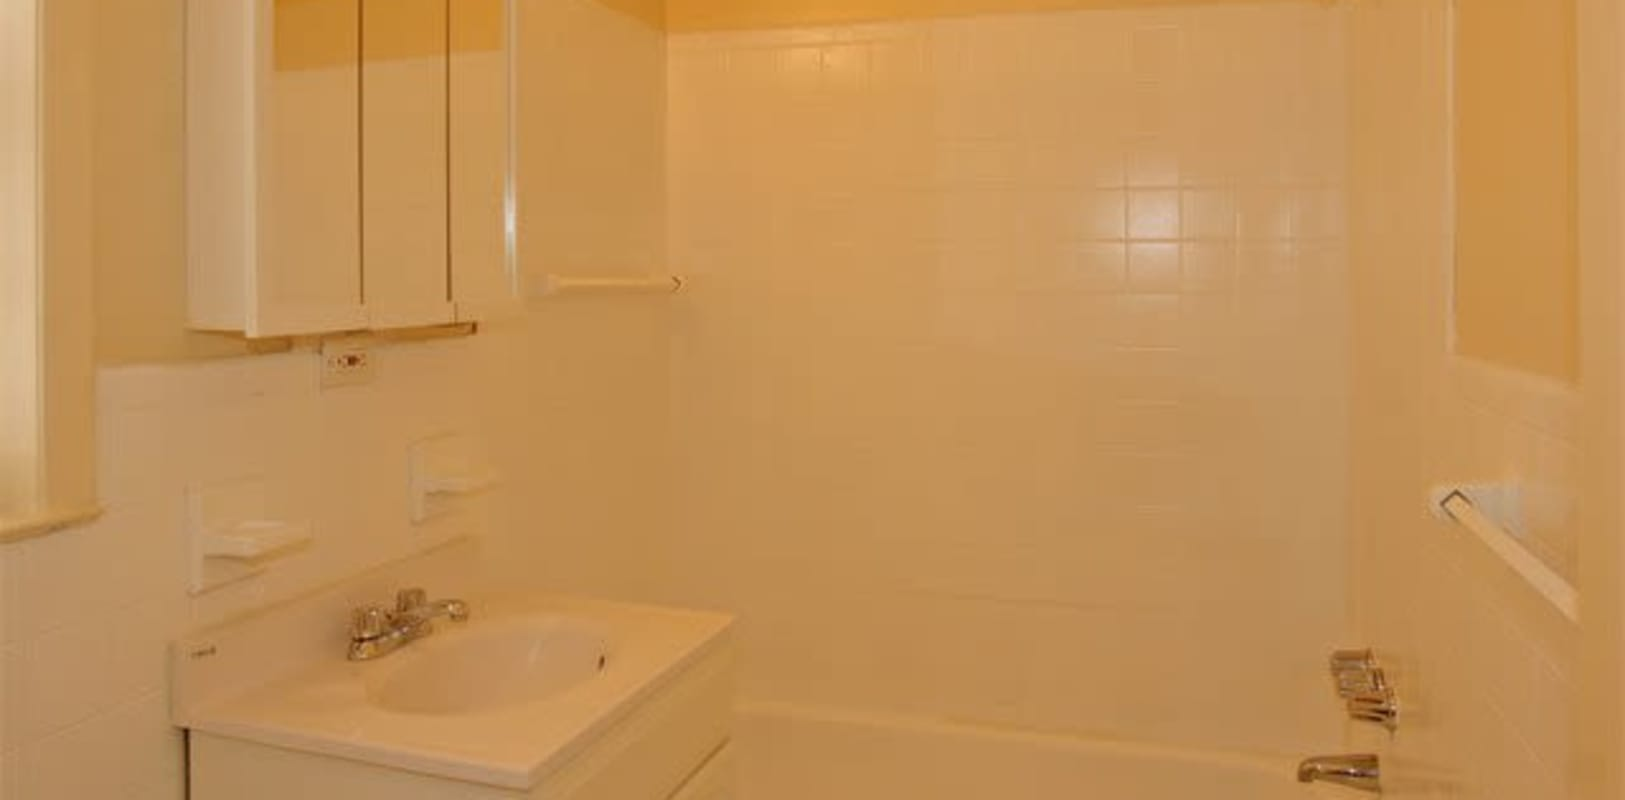 Clean bathroom at Hunterdon Mews in Flemington, New Jersey